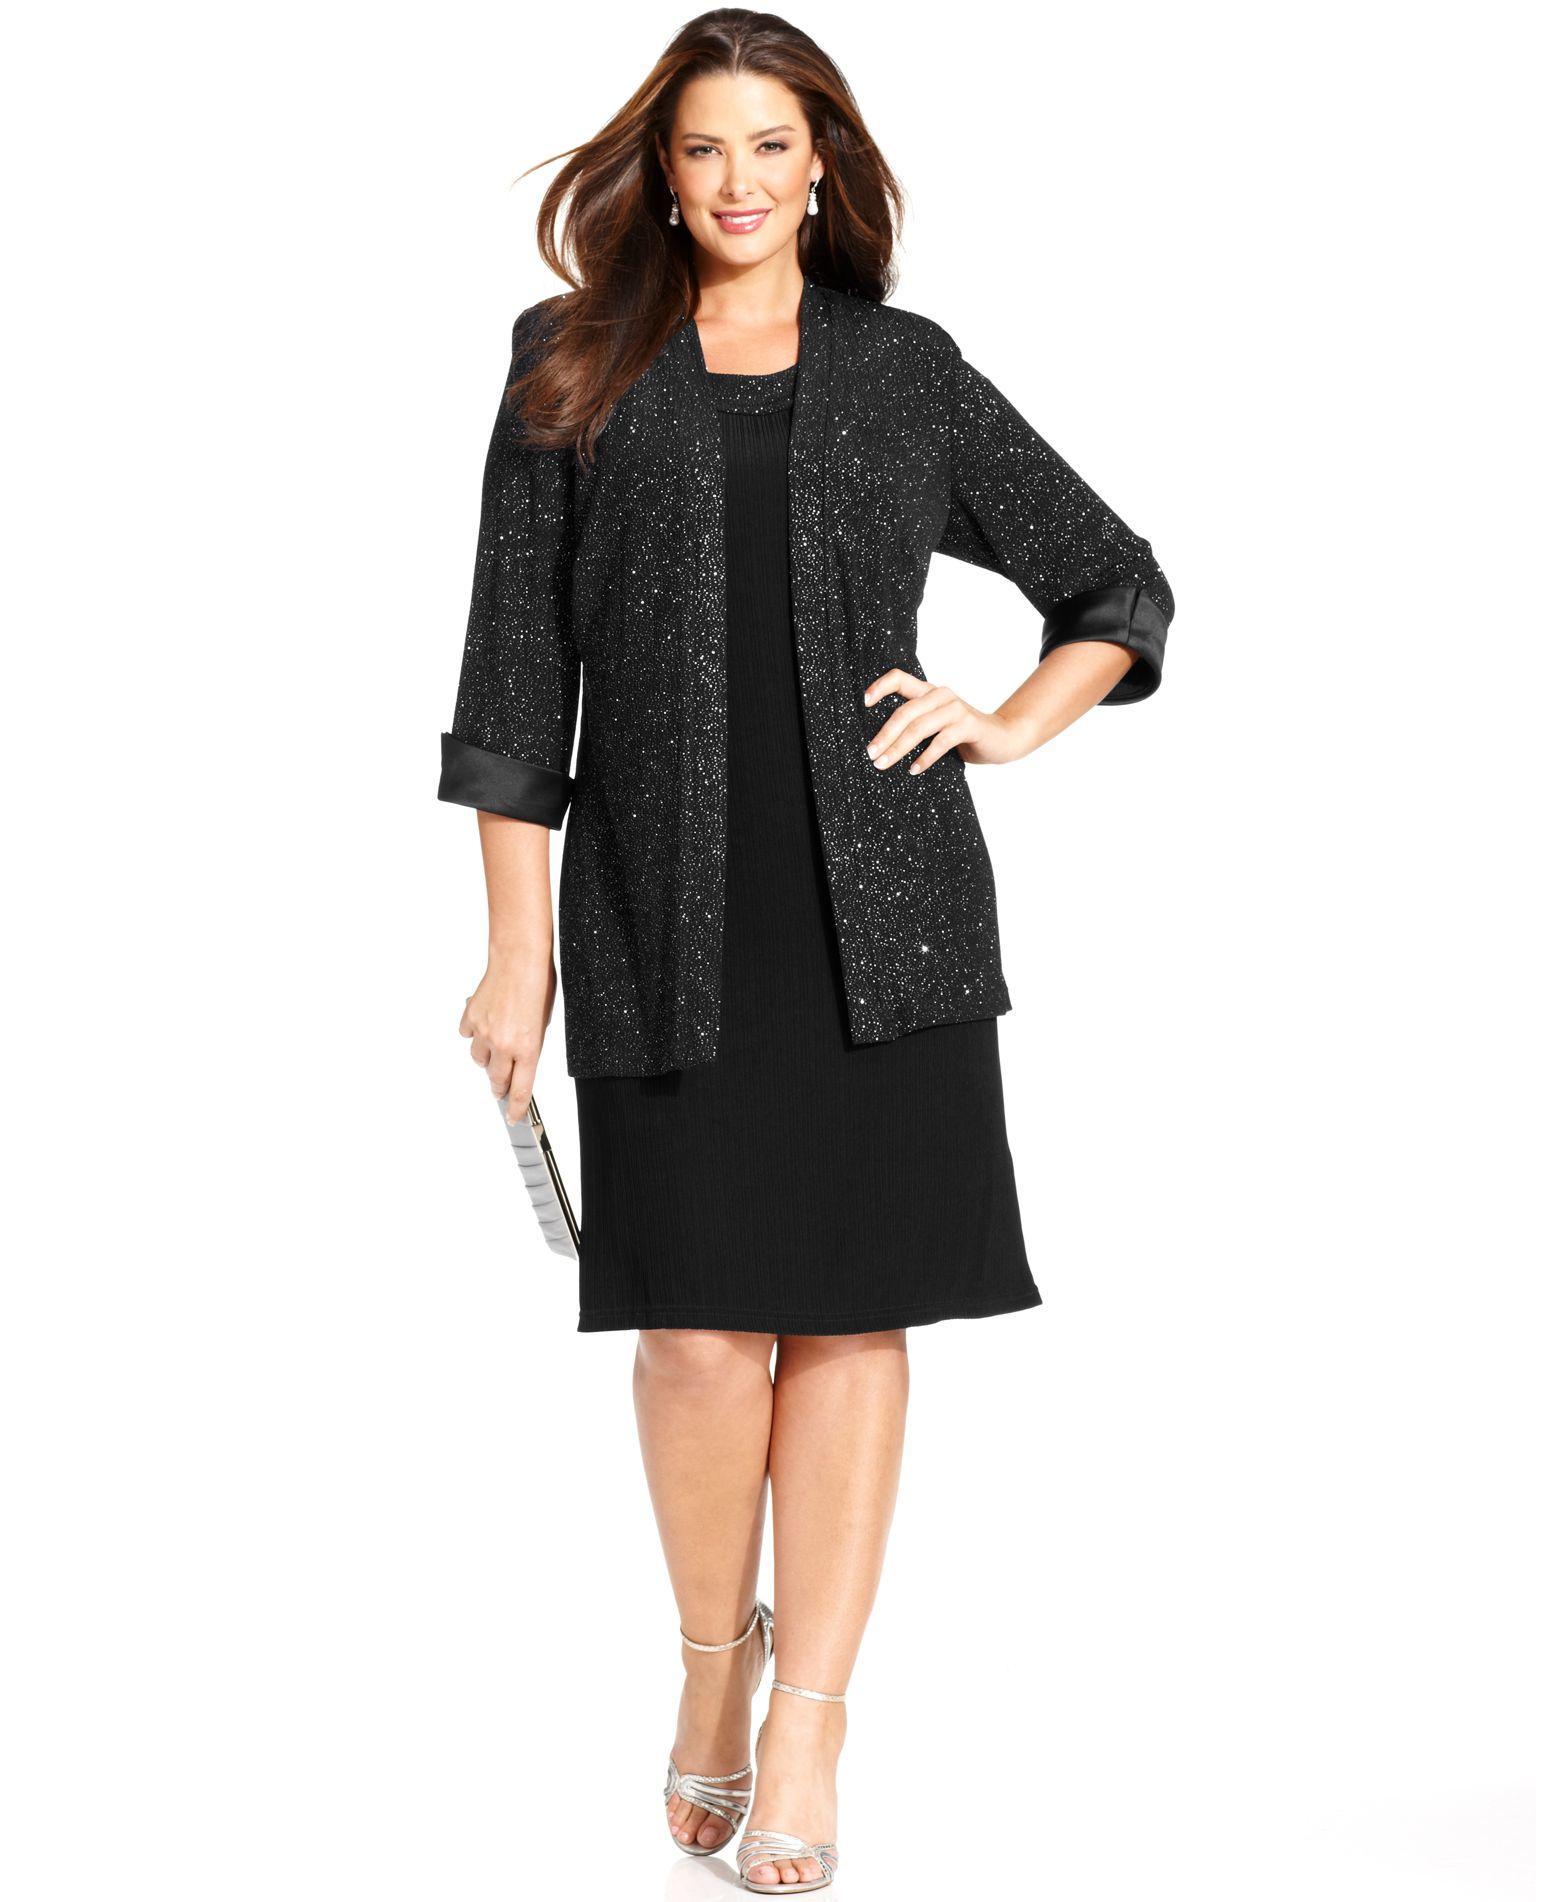 R m richards r m richards plus size metallic shift dress for Macy black dress wear to wedding